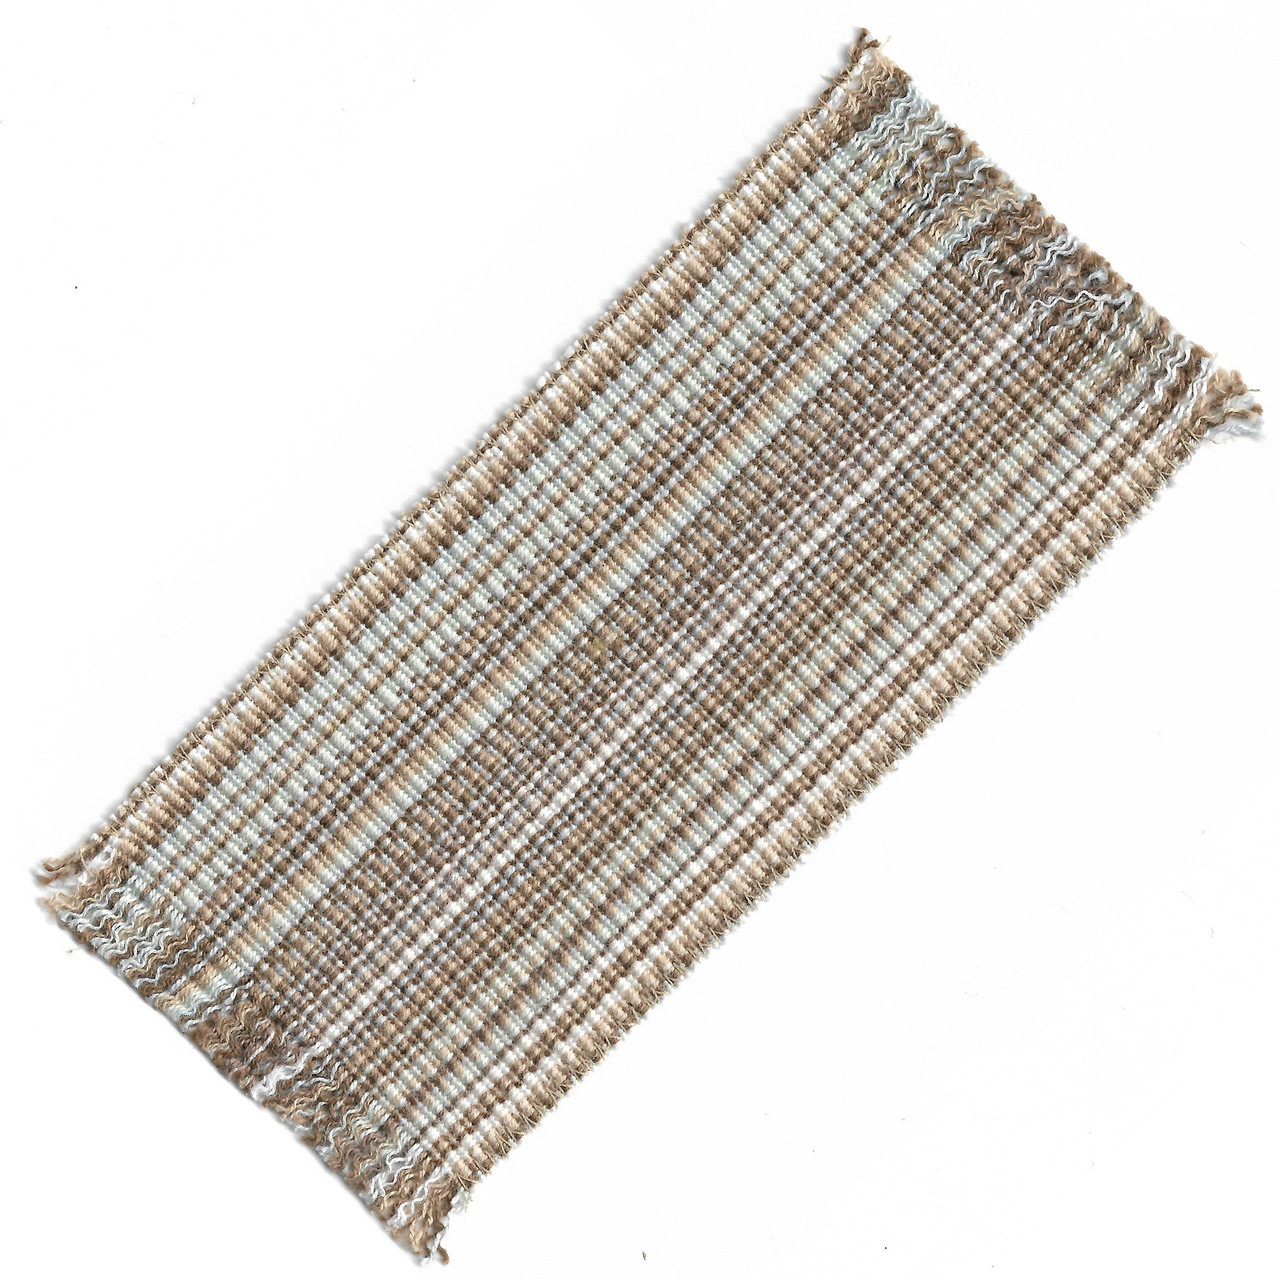 Small Woven Rug Neutral Tones (SMSHWRSZ3)